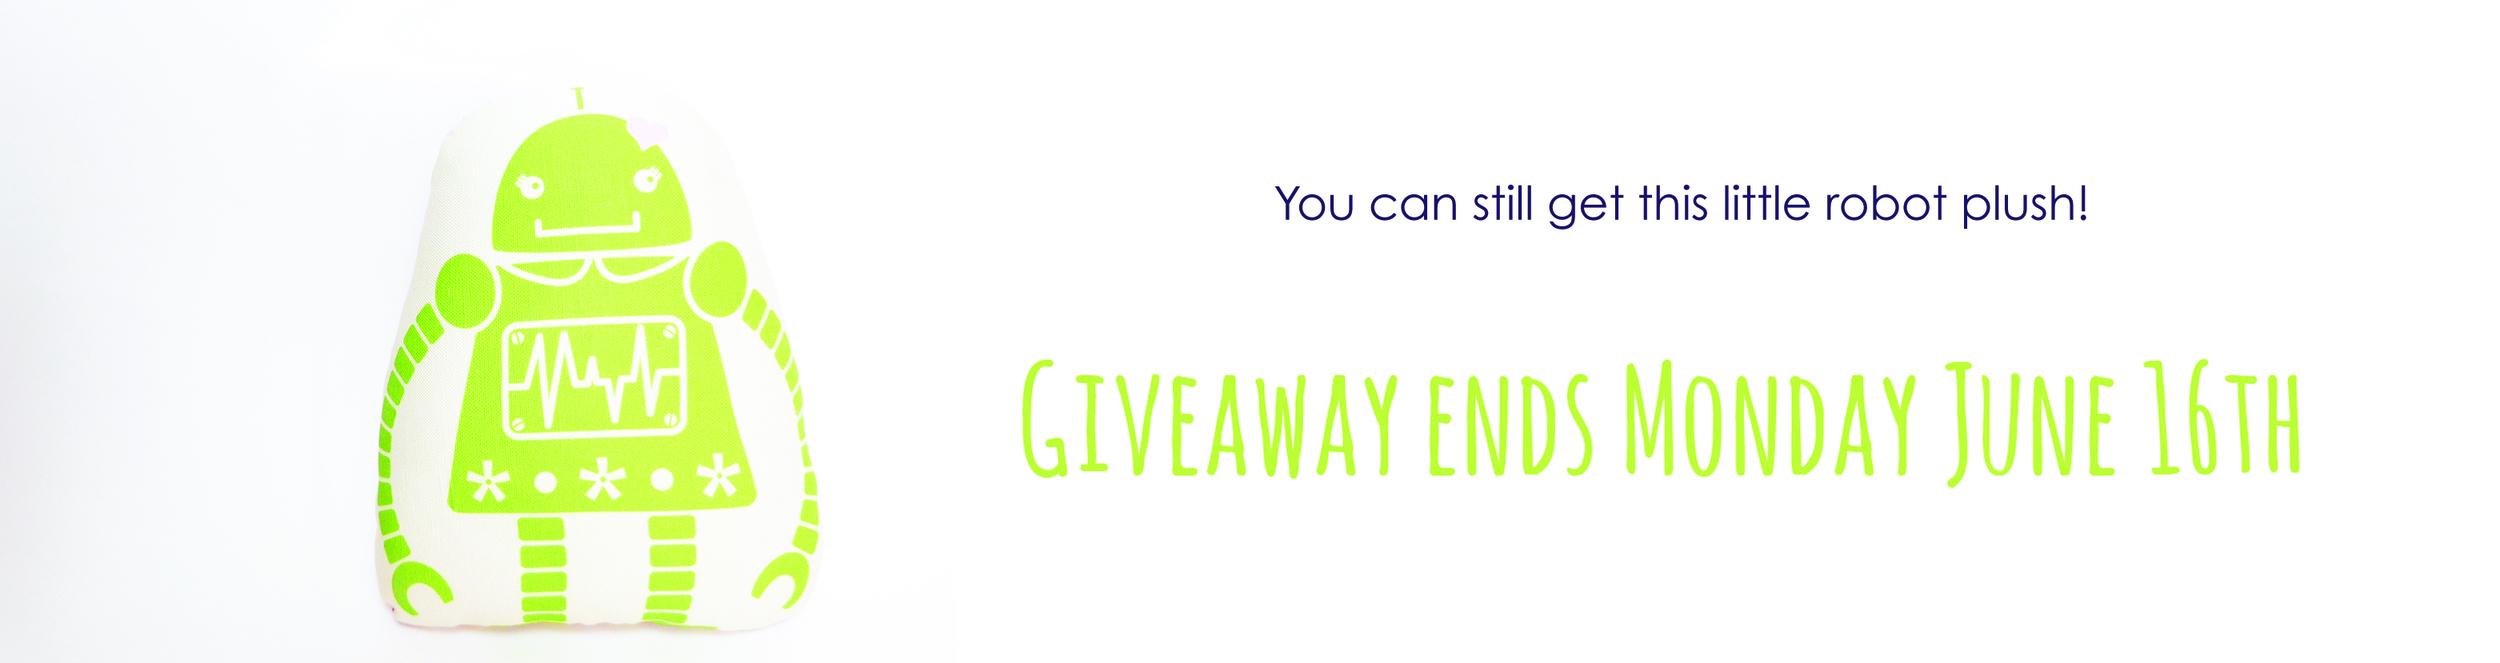 GiveawayReminder.jpg